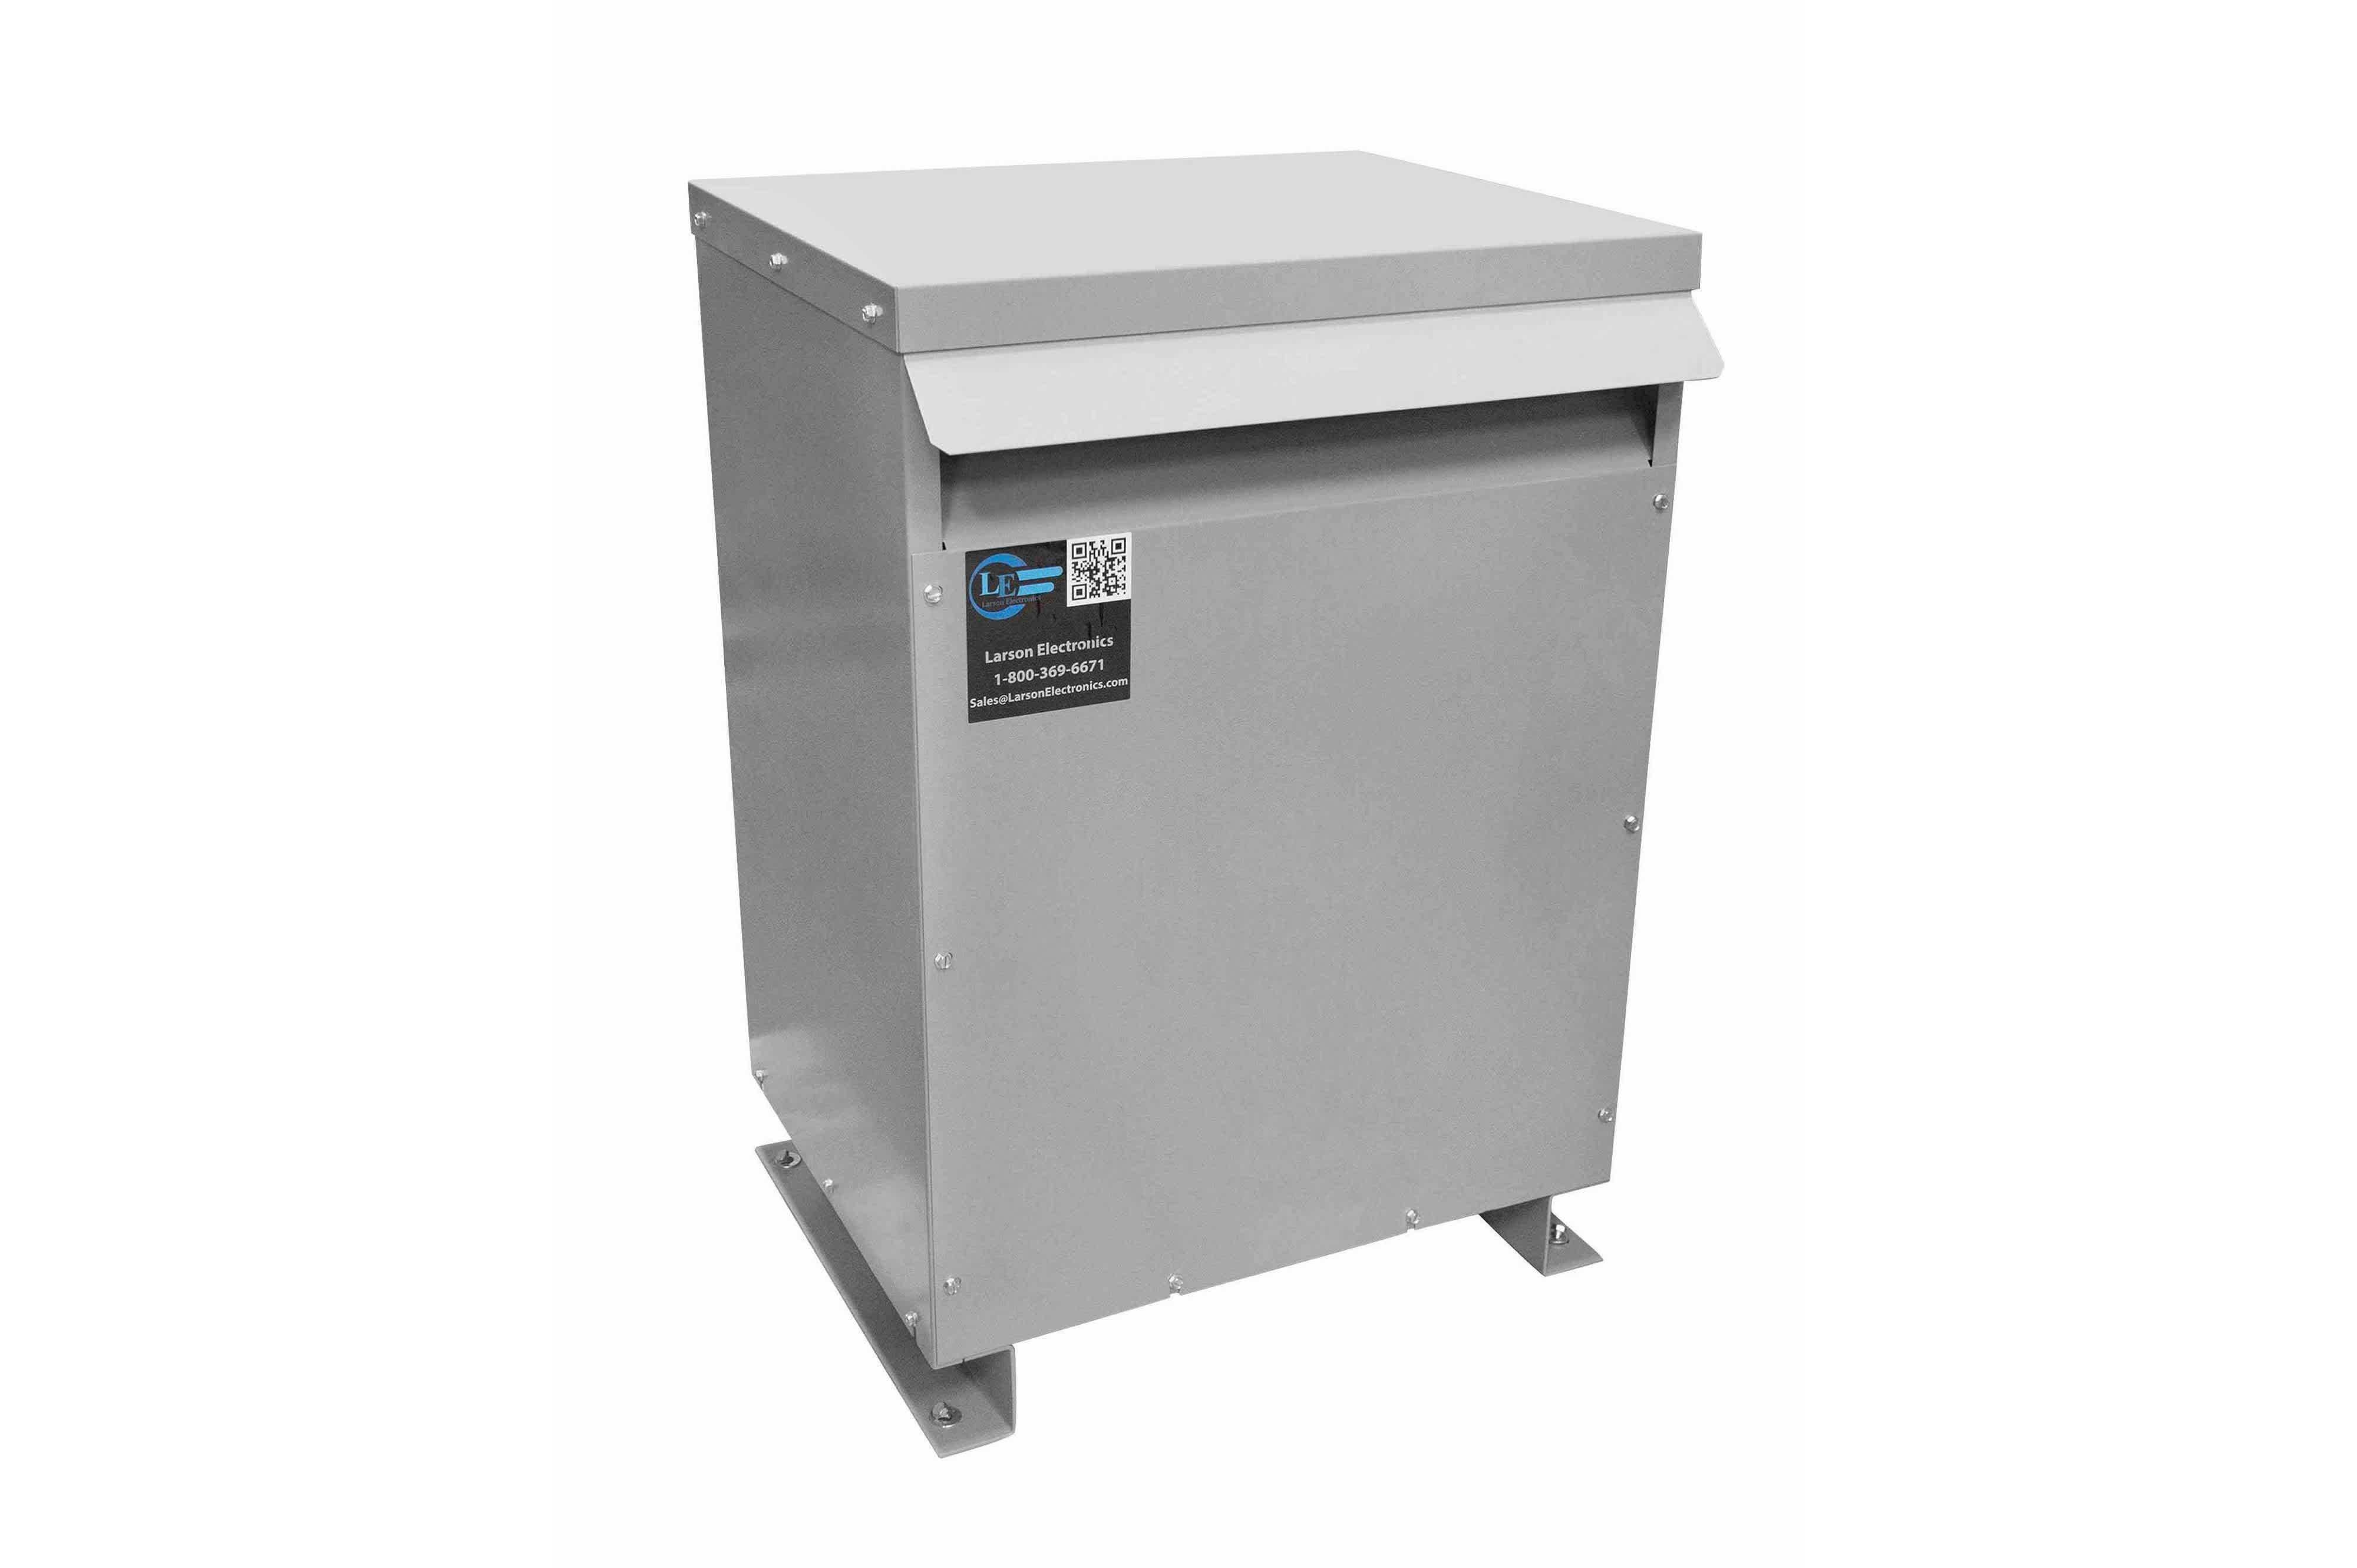 500 kVA 3PH DOE Transformer, 208V Delta Primary, 380Y/220 Wye-N Secondary, N3R, Ventilated, 60 Hz